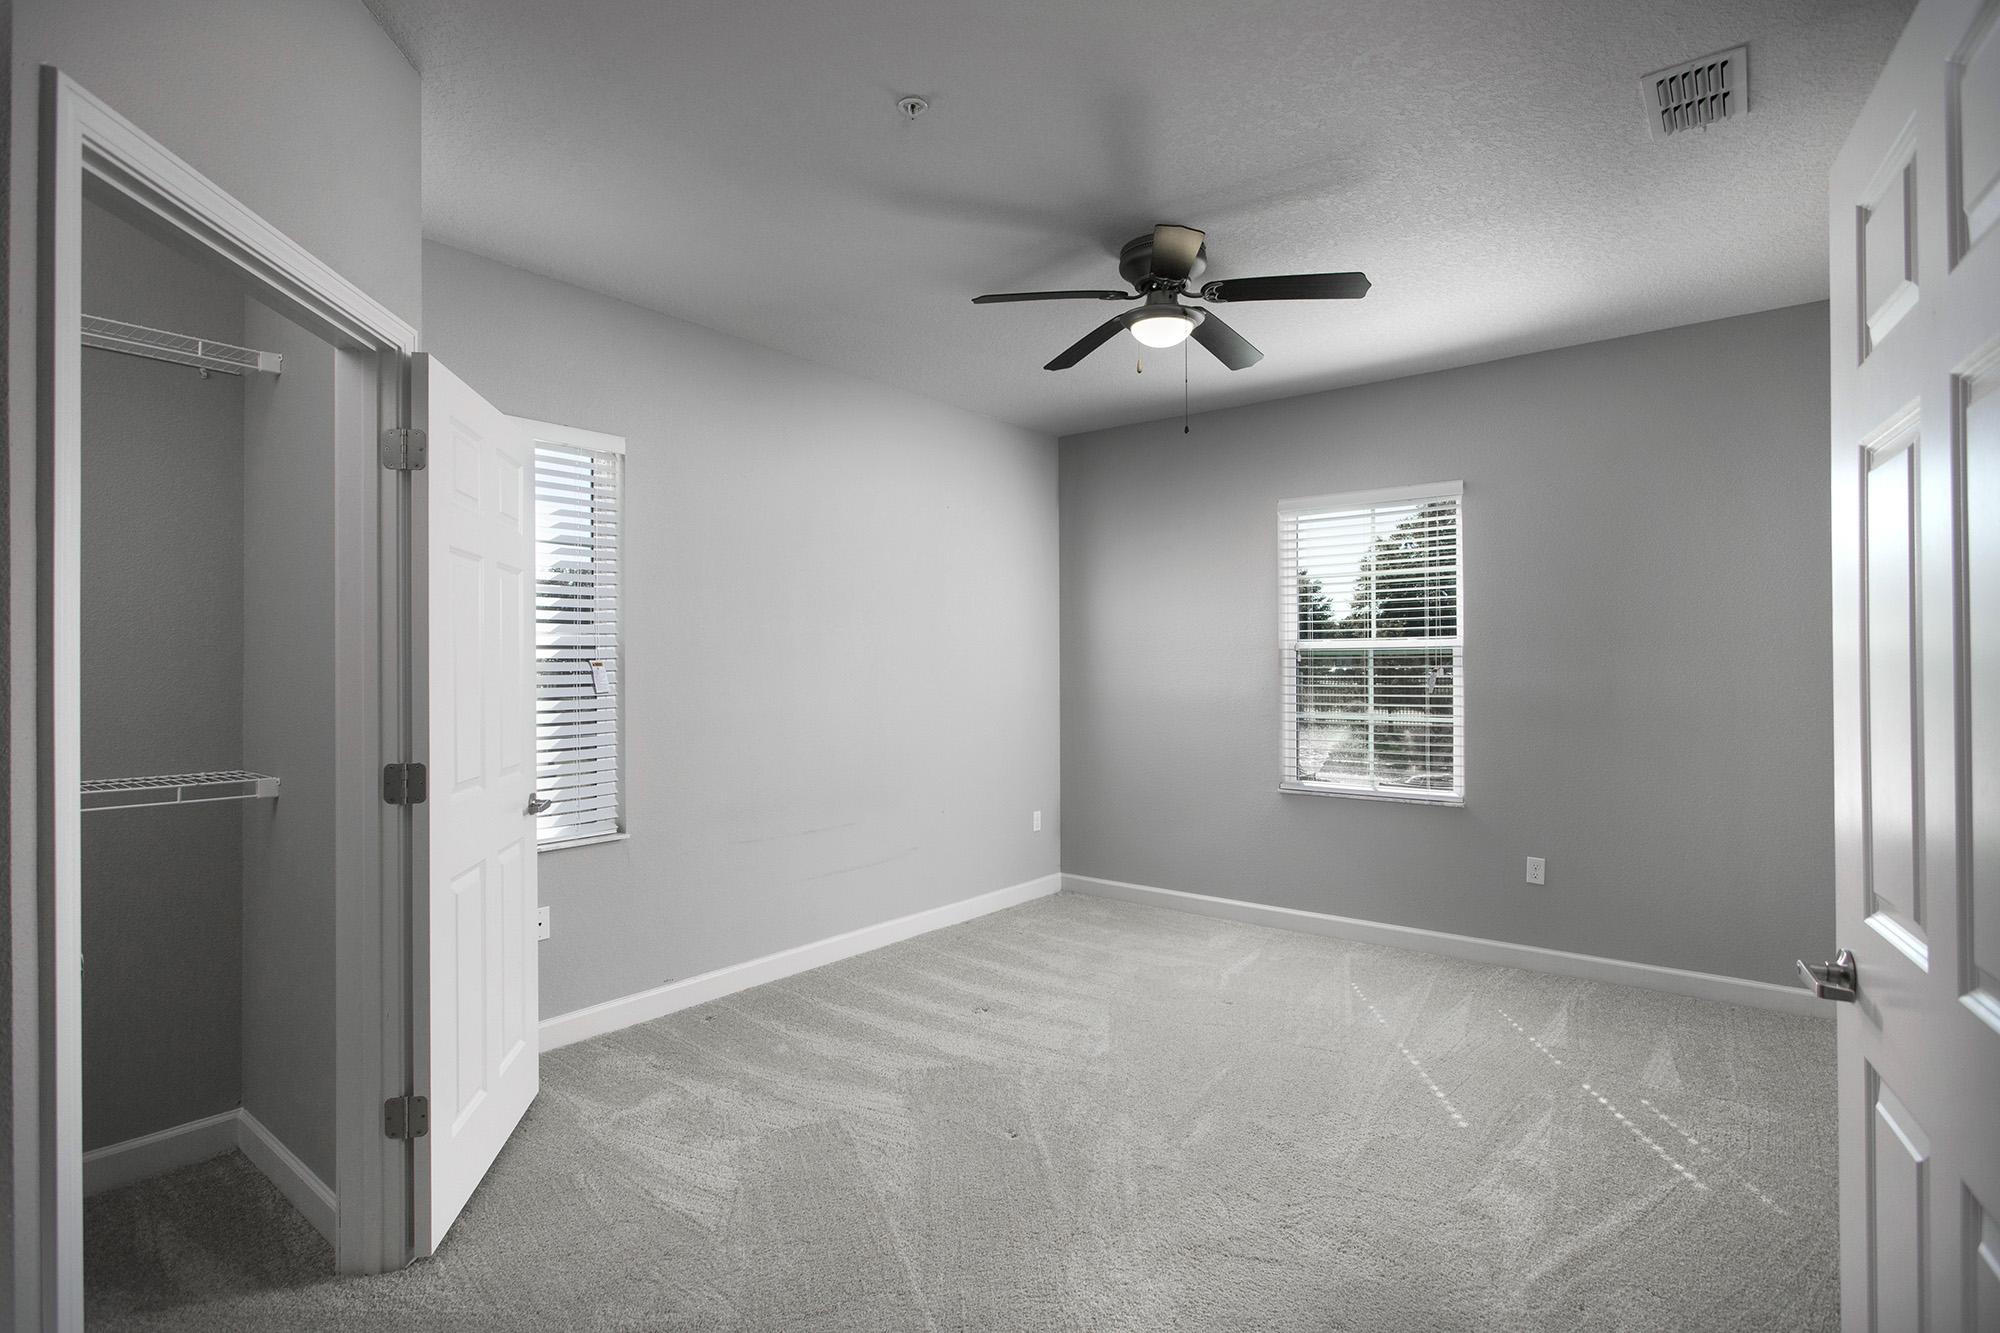 CharlestonEdge-Rental-Apartment-Brandon-Tampa-Florida-Pool-Bedrooms-Interior-3.jpg